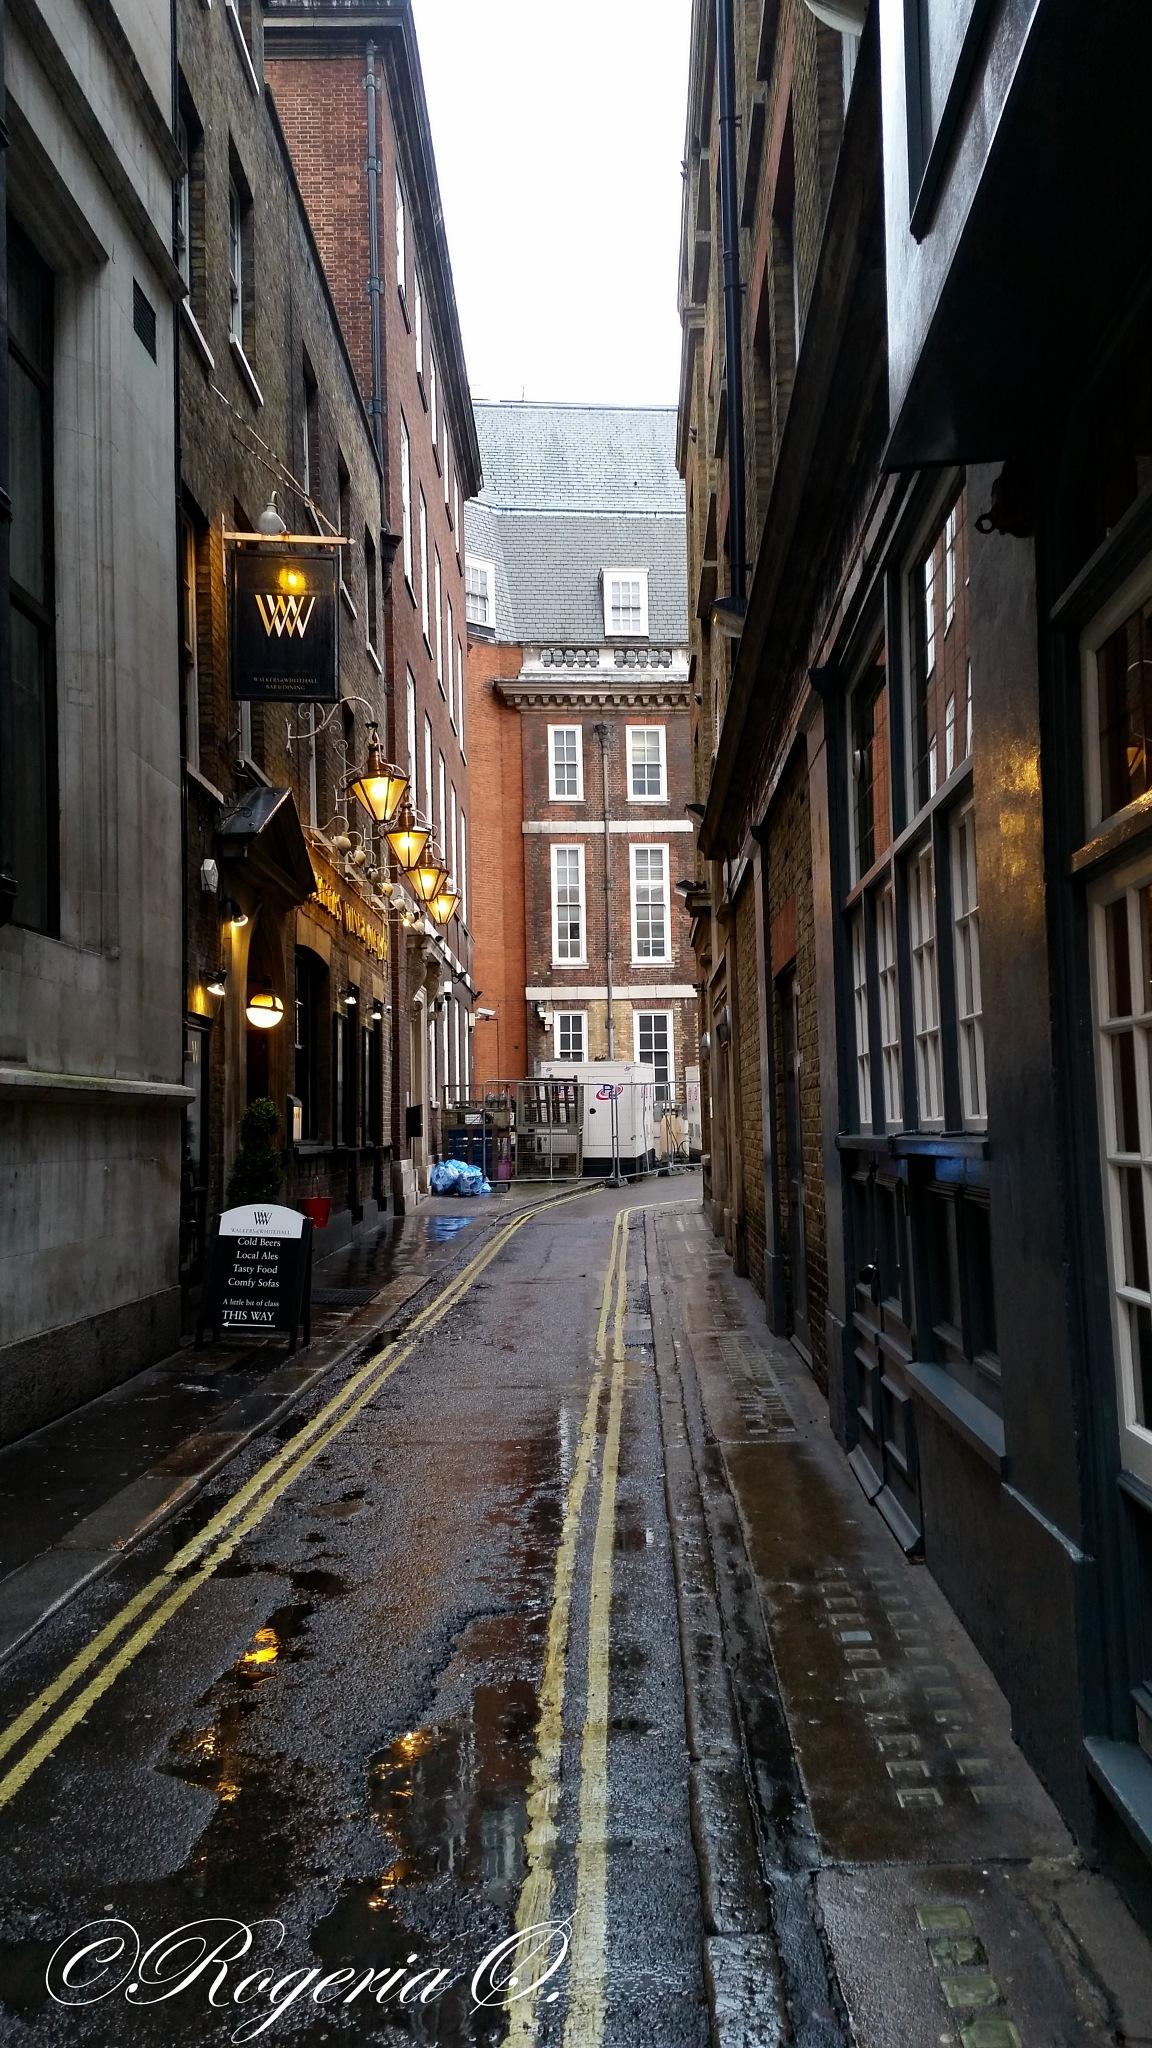 London alley by Rogeria Øksendal